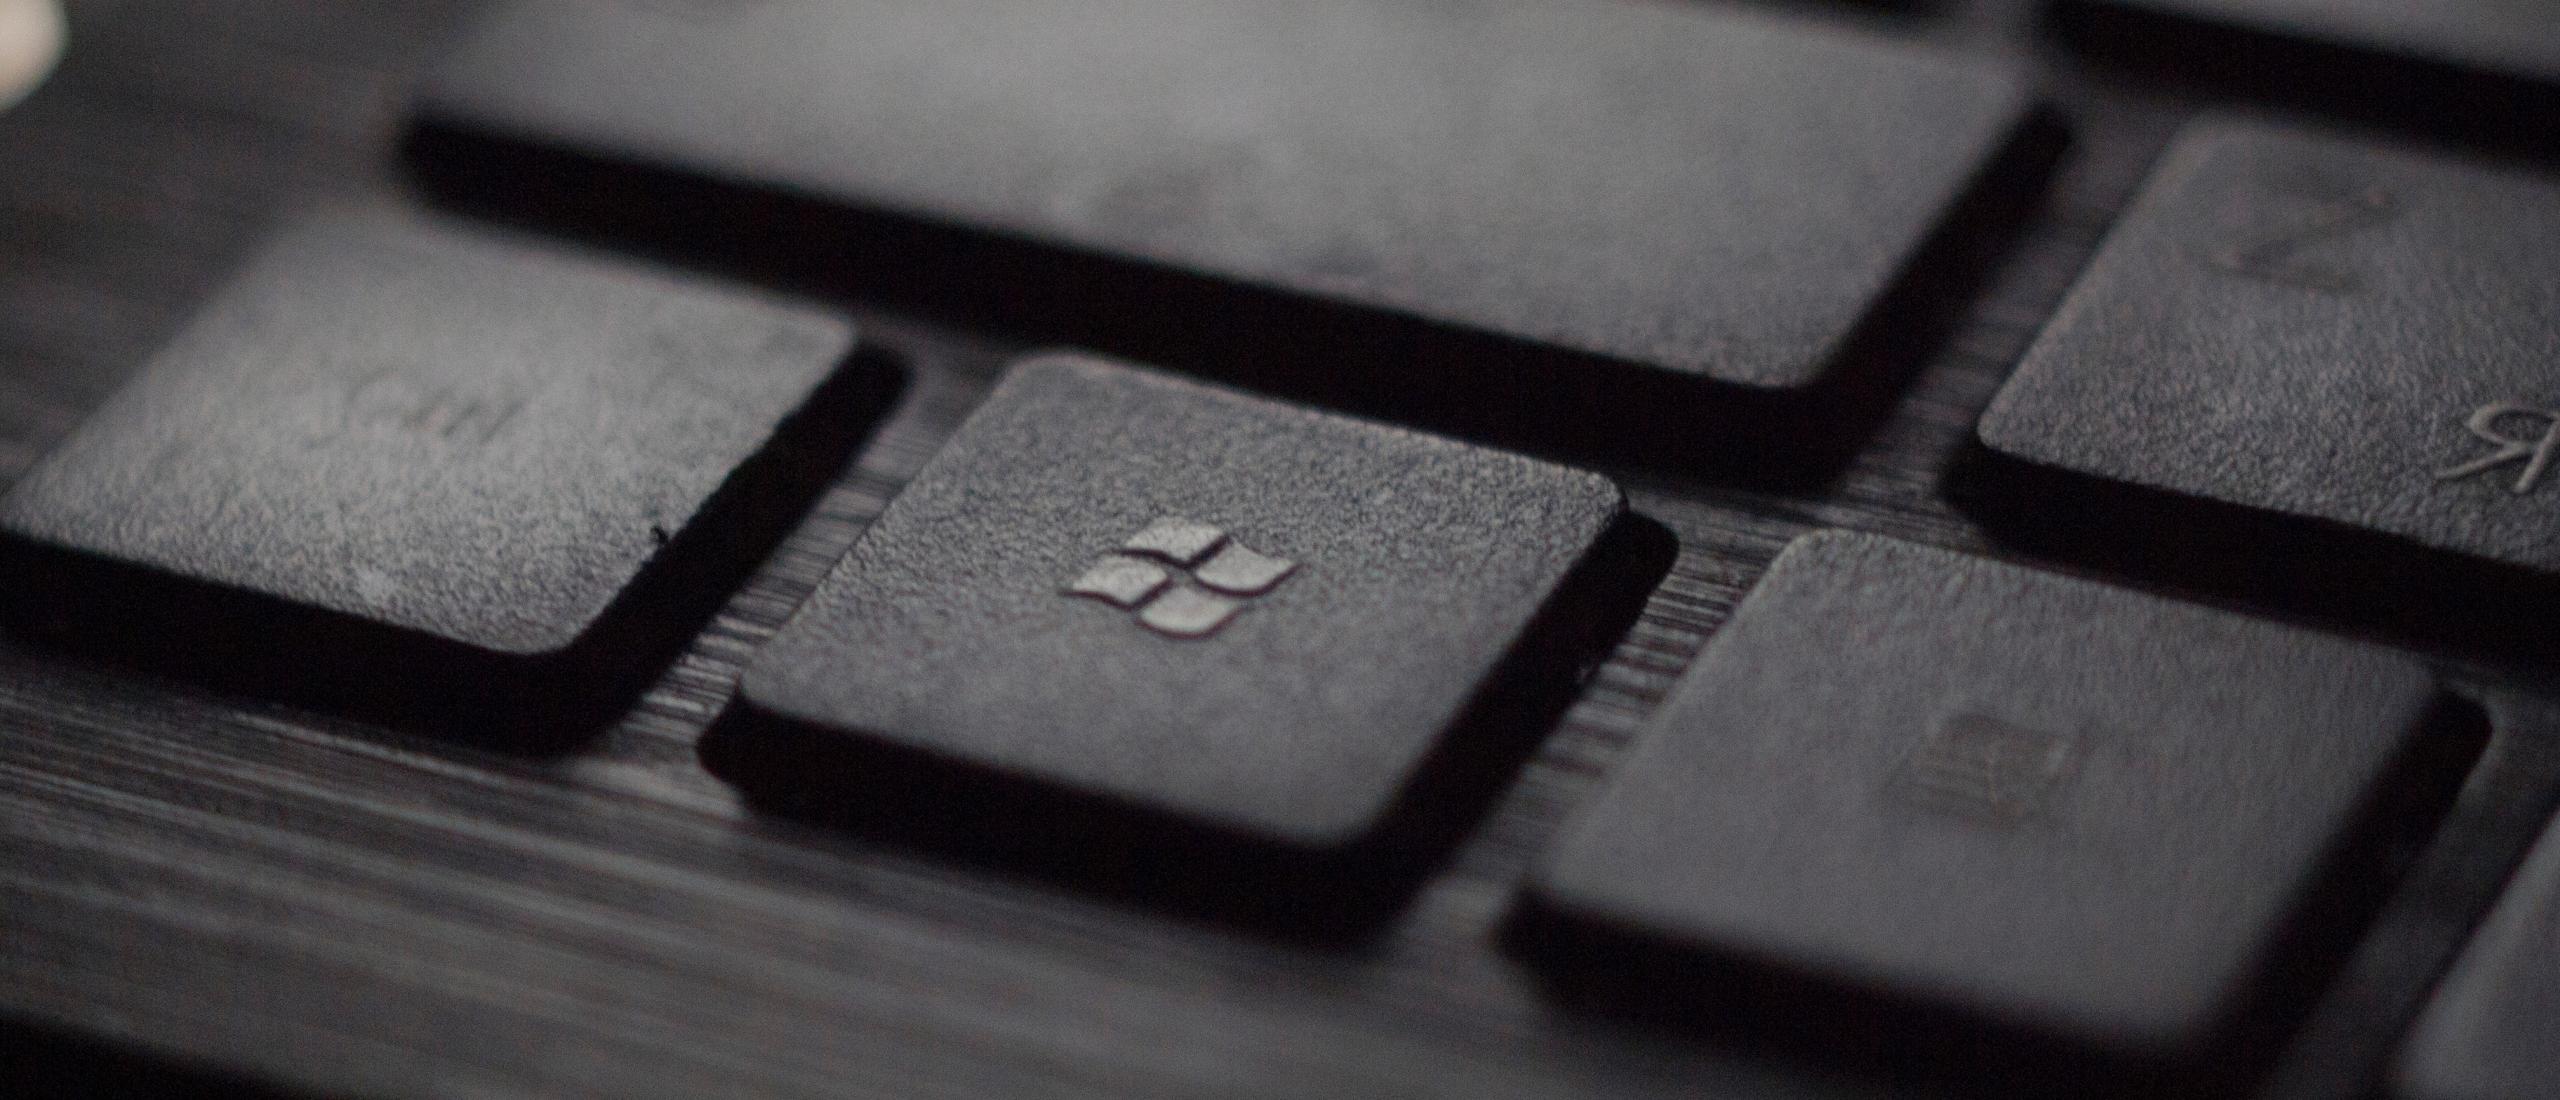 Secure en privacy compliant met Microsoft 365